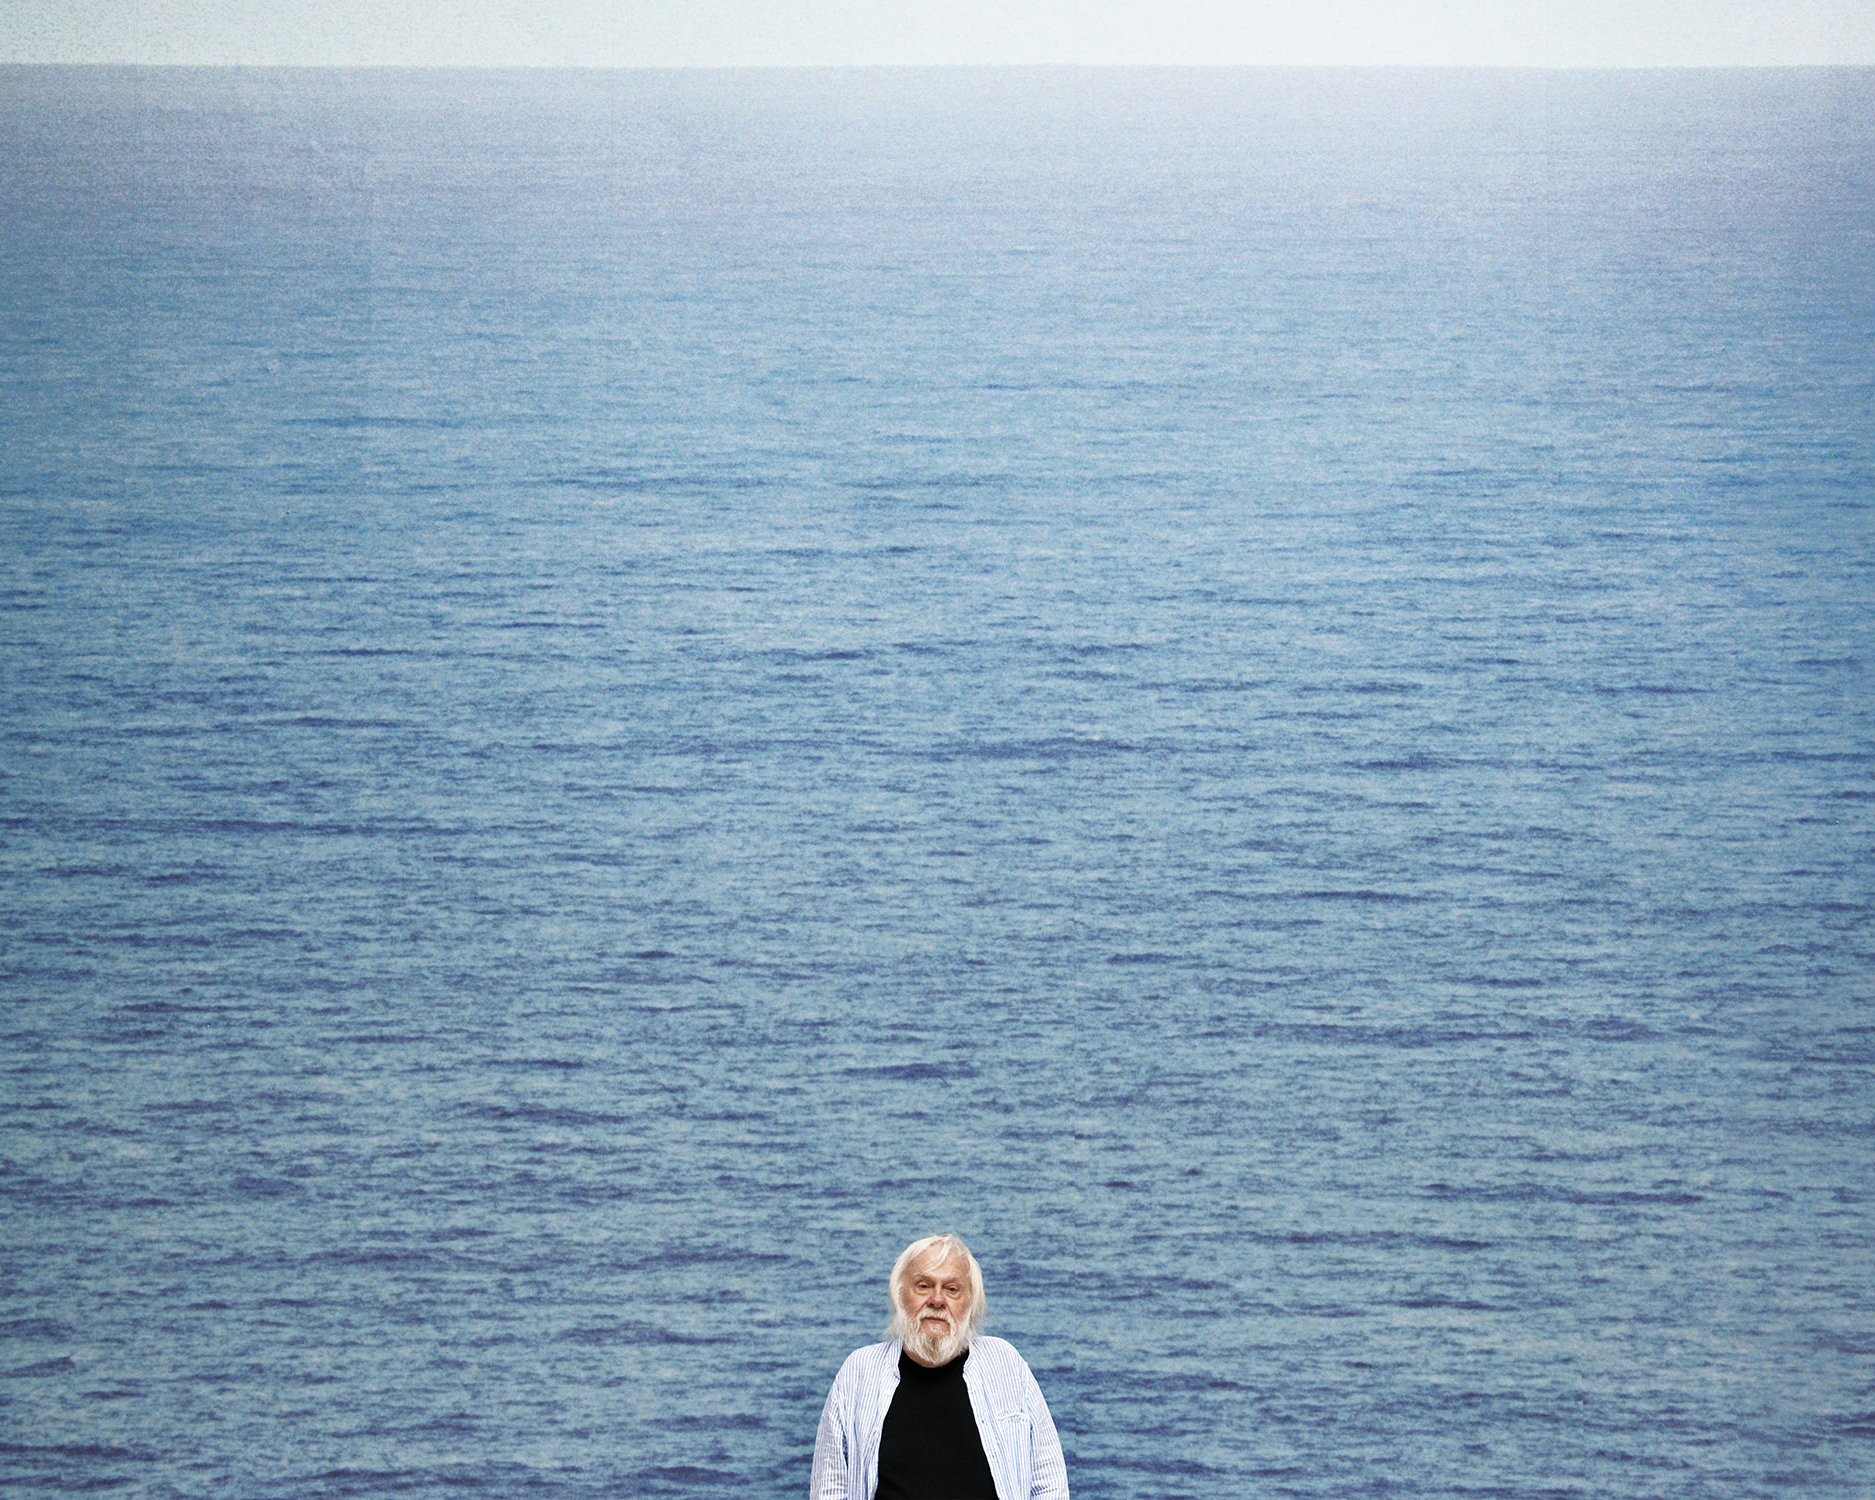 John Baldessari, 2009 Venice, Italy